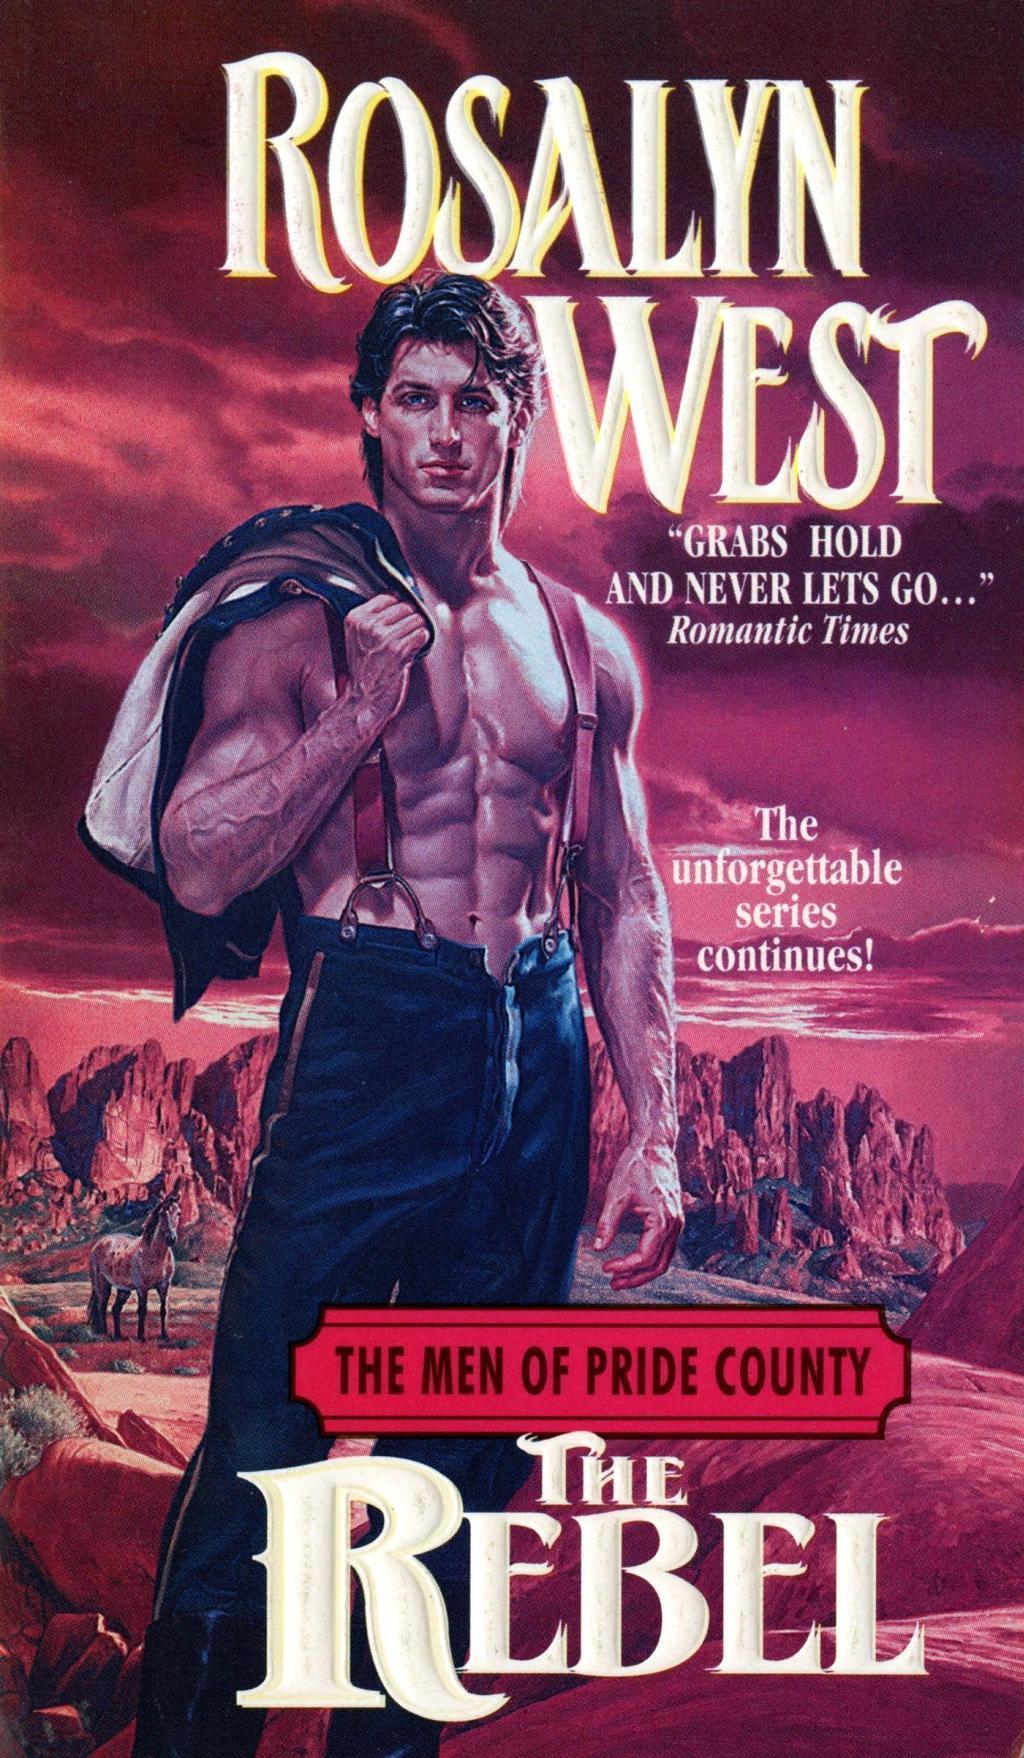 The Men of Pride County: The Rebel